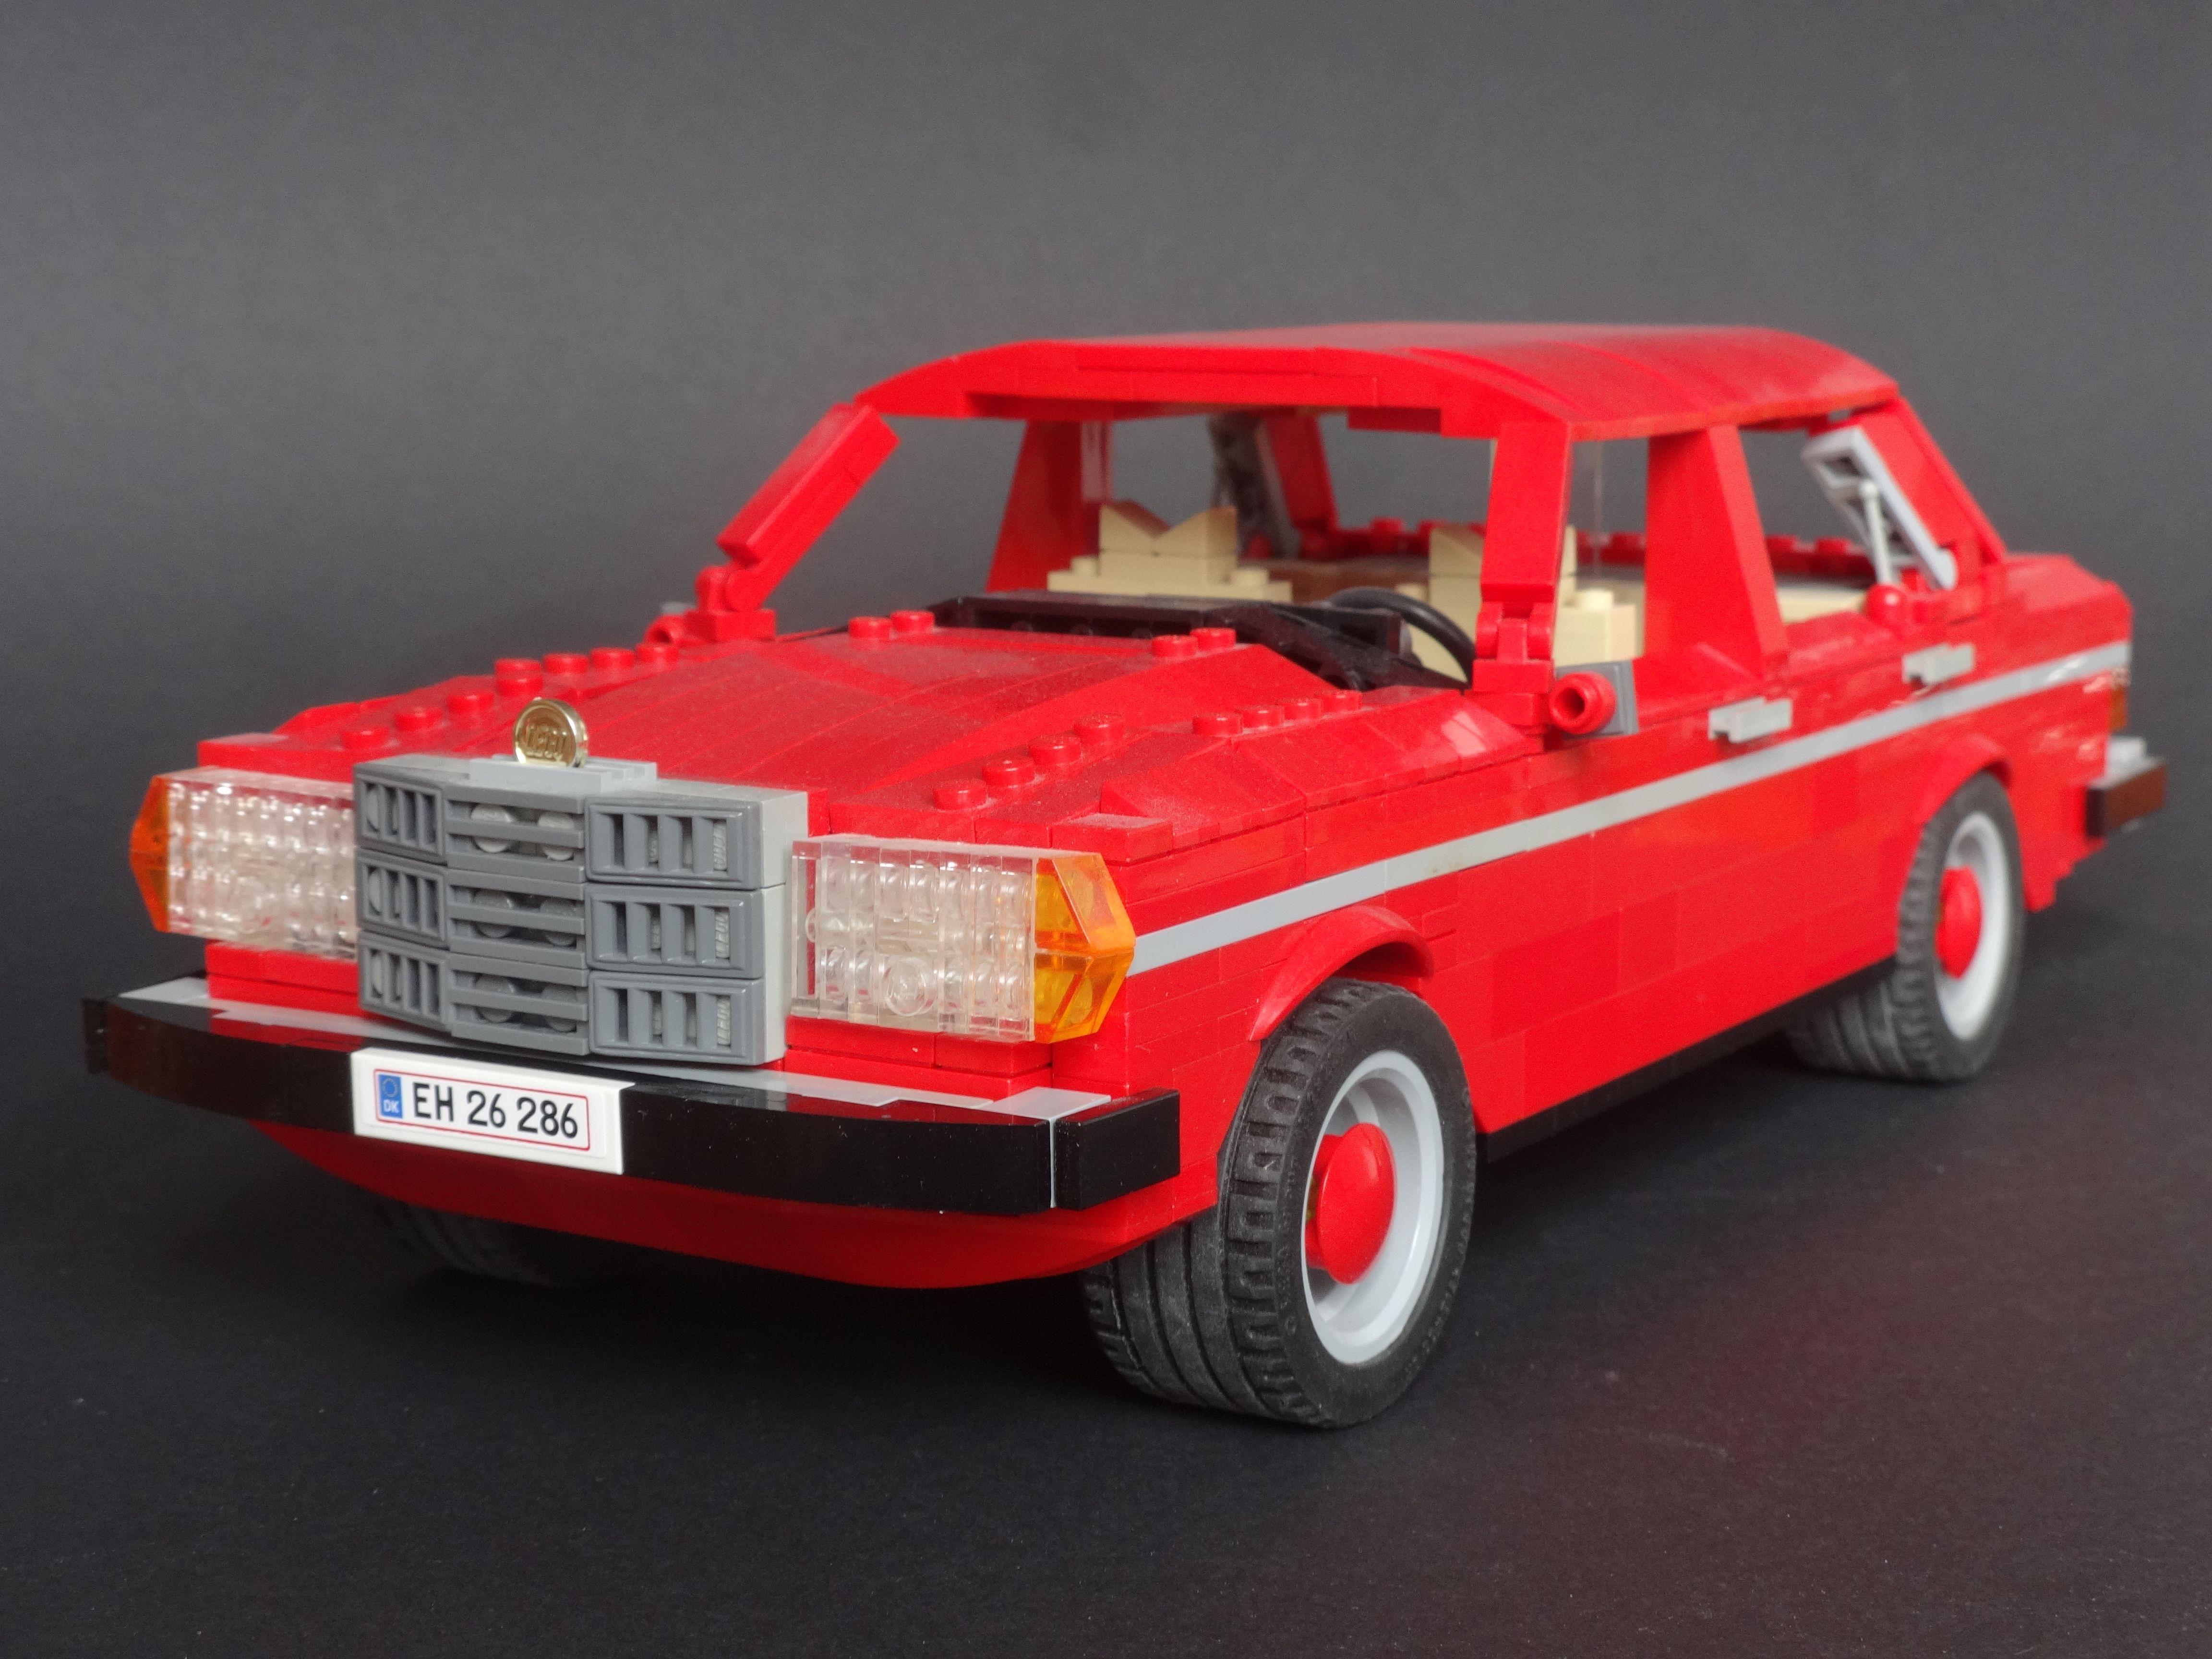 lego mercedes w123 lego autohof pinterest lego lego technic and lego vehicles. Black Bedroom Furniture Sets. Home Design Ideas